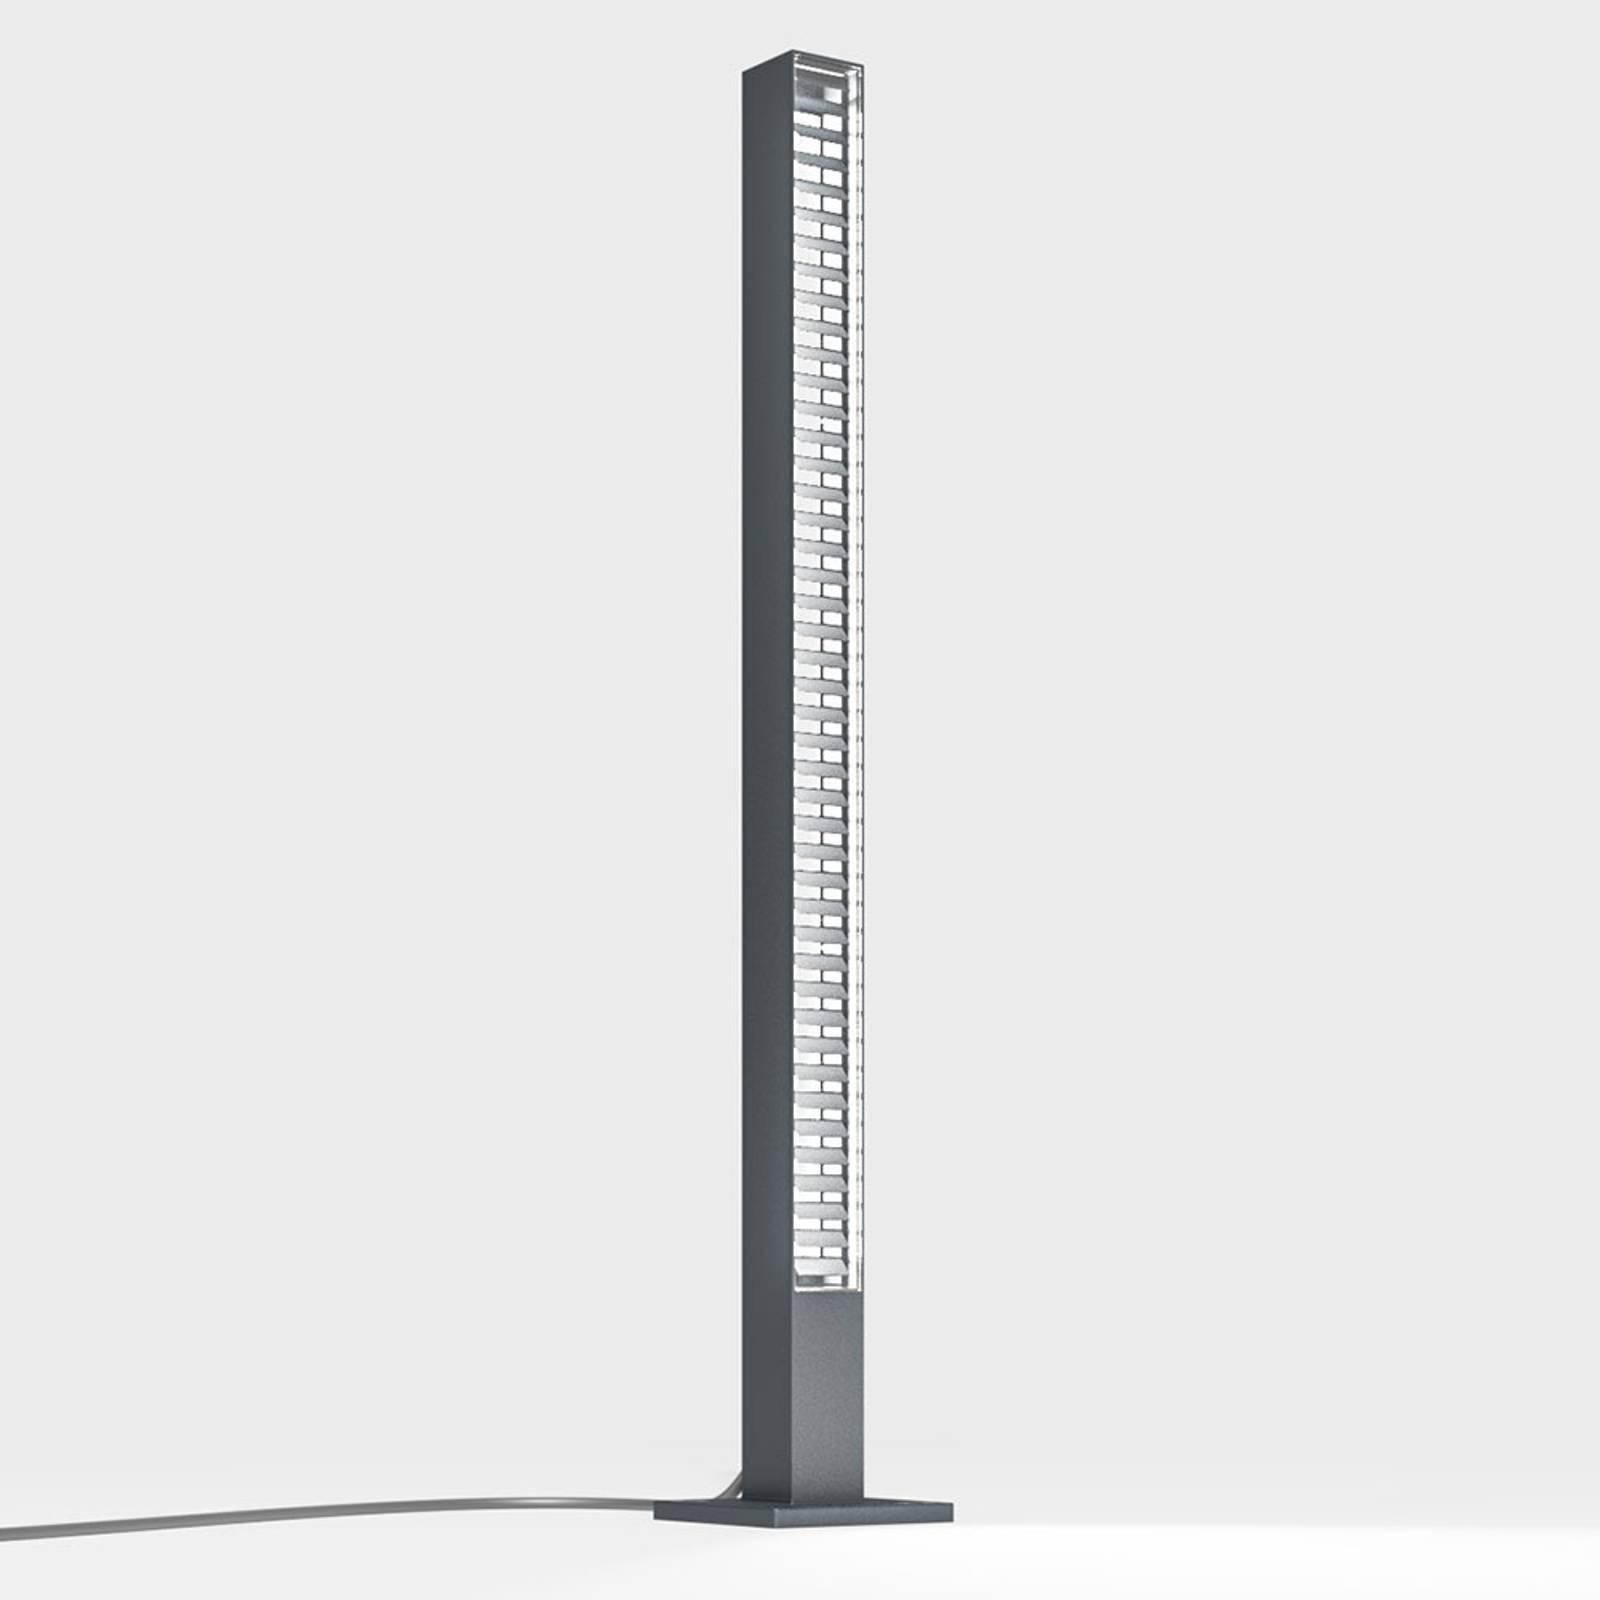 IP44.de lin base słupek ogrodowy LED, antracytowy